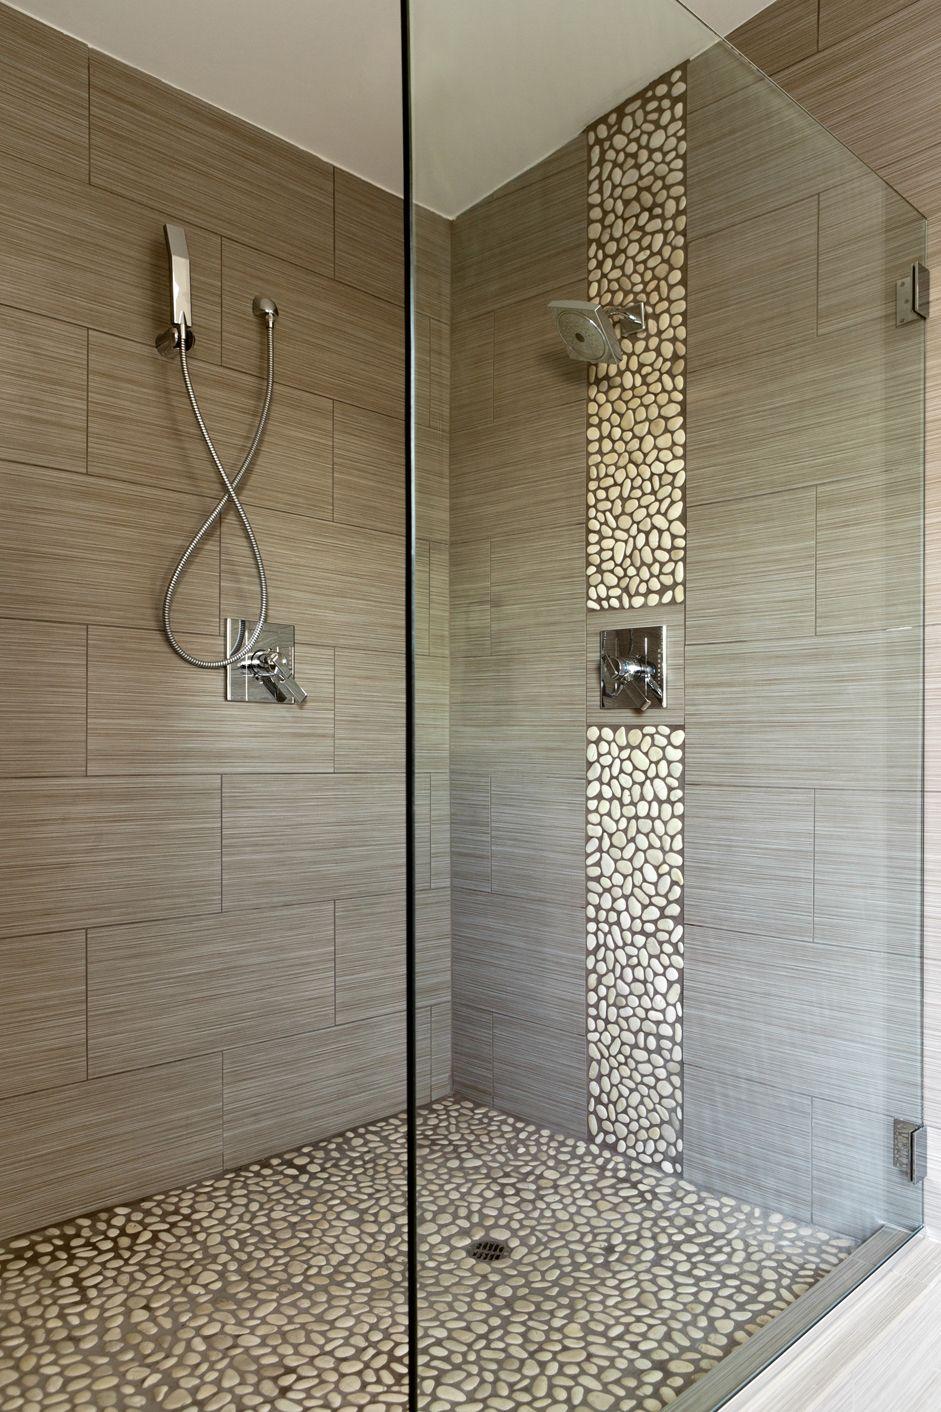 Badezimmer dusche gemauert  Gemauerte Dusche selber bauen | Badezimmer, Bäder und Badideen